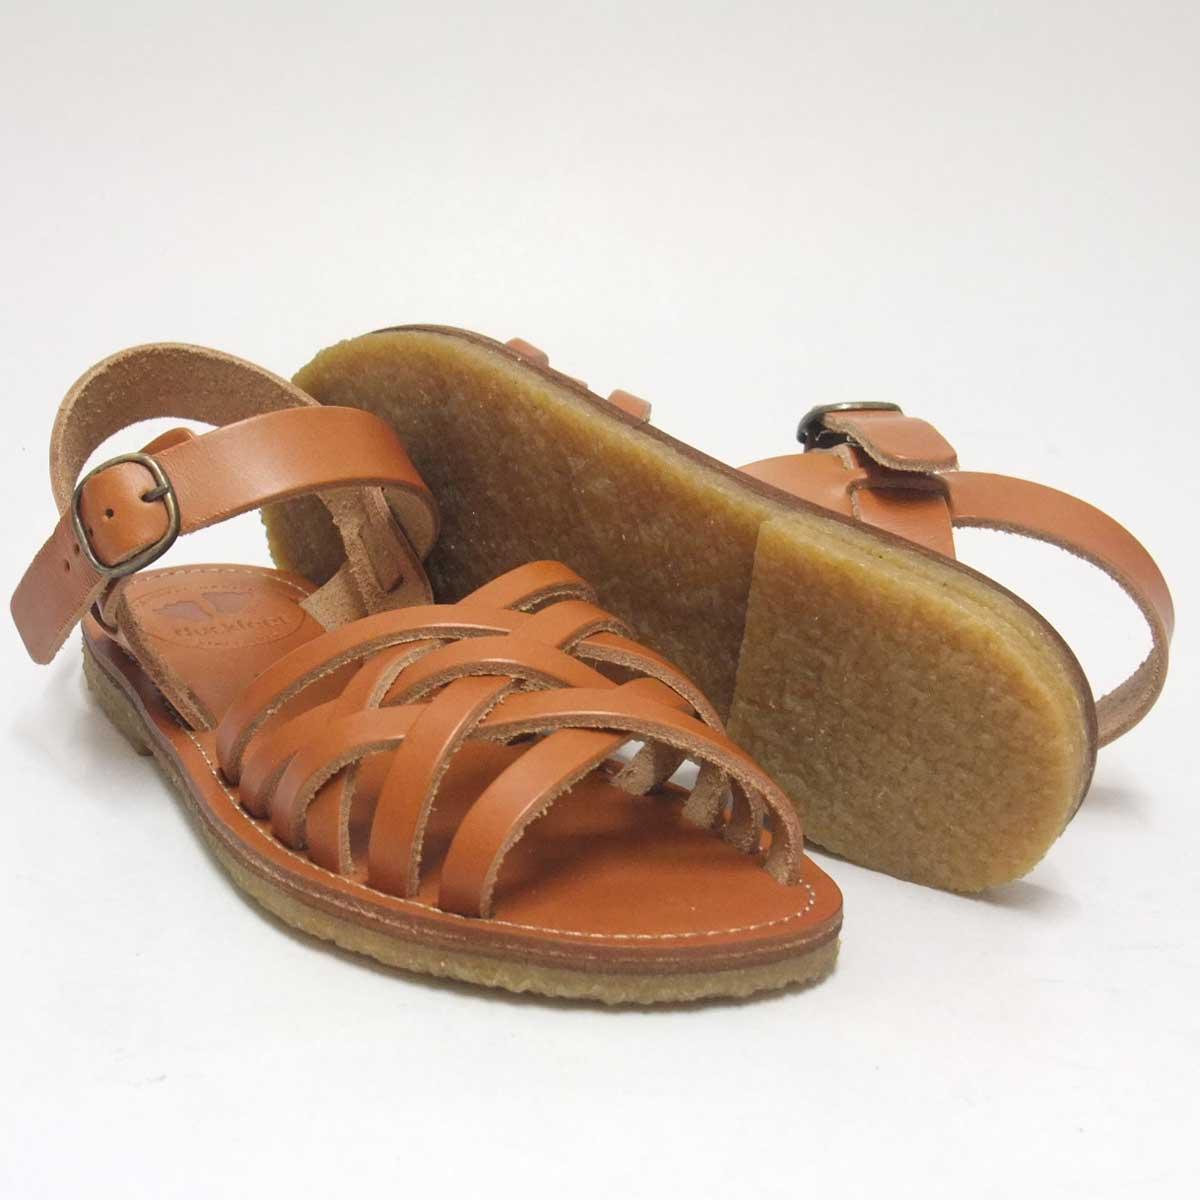 duckfeet ダックフィート ナチュラルコンフォートサンダル 0100 バイオクレープソールの快適サンダル(日本製)「靴」